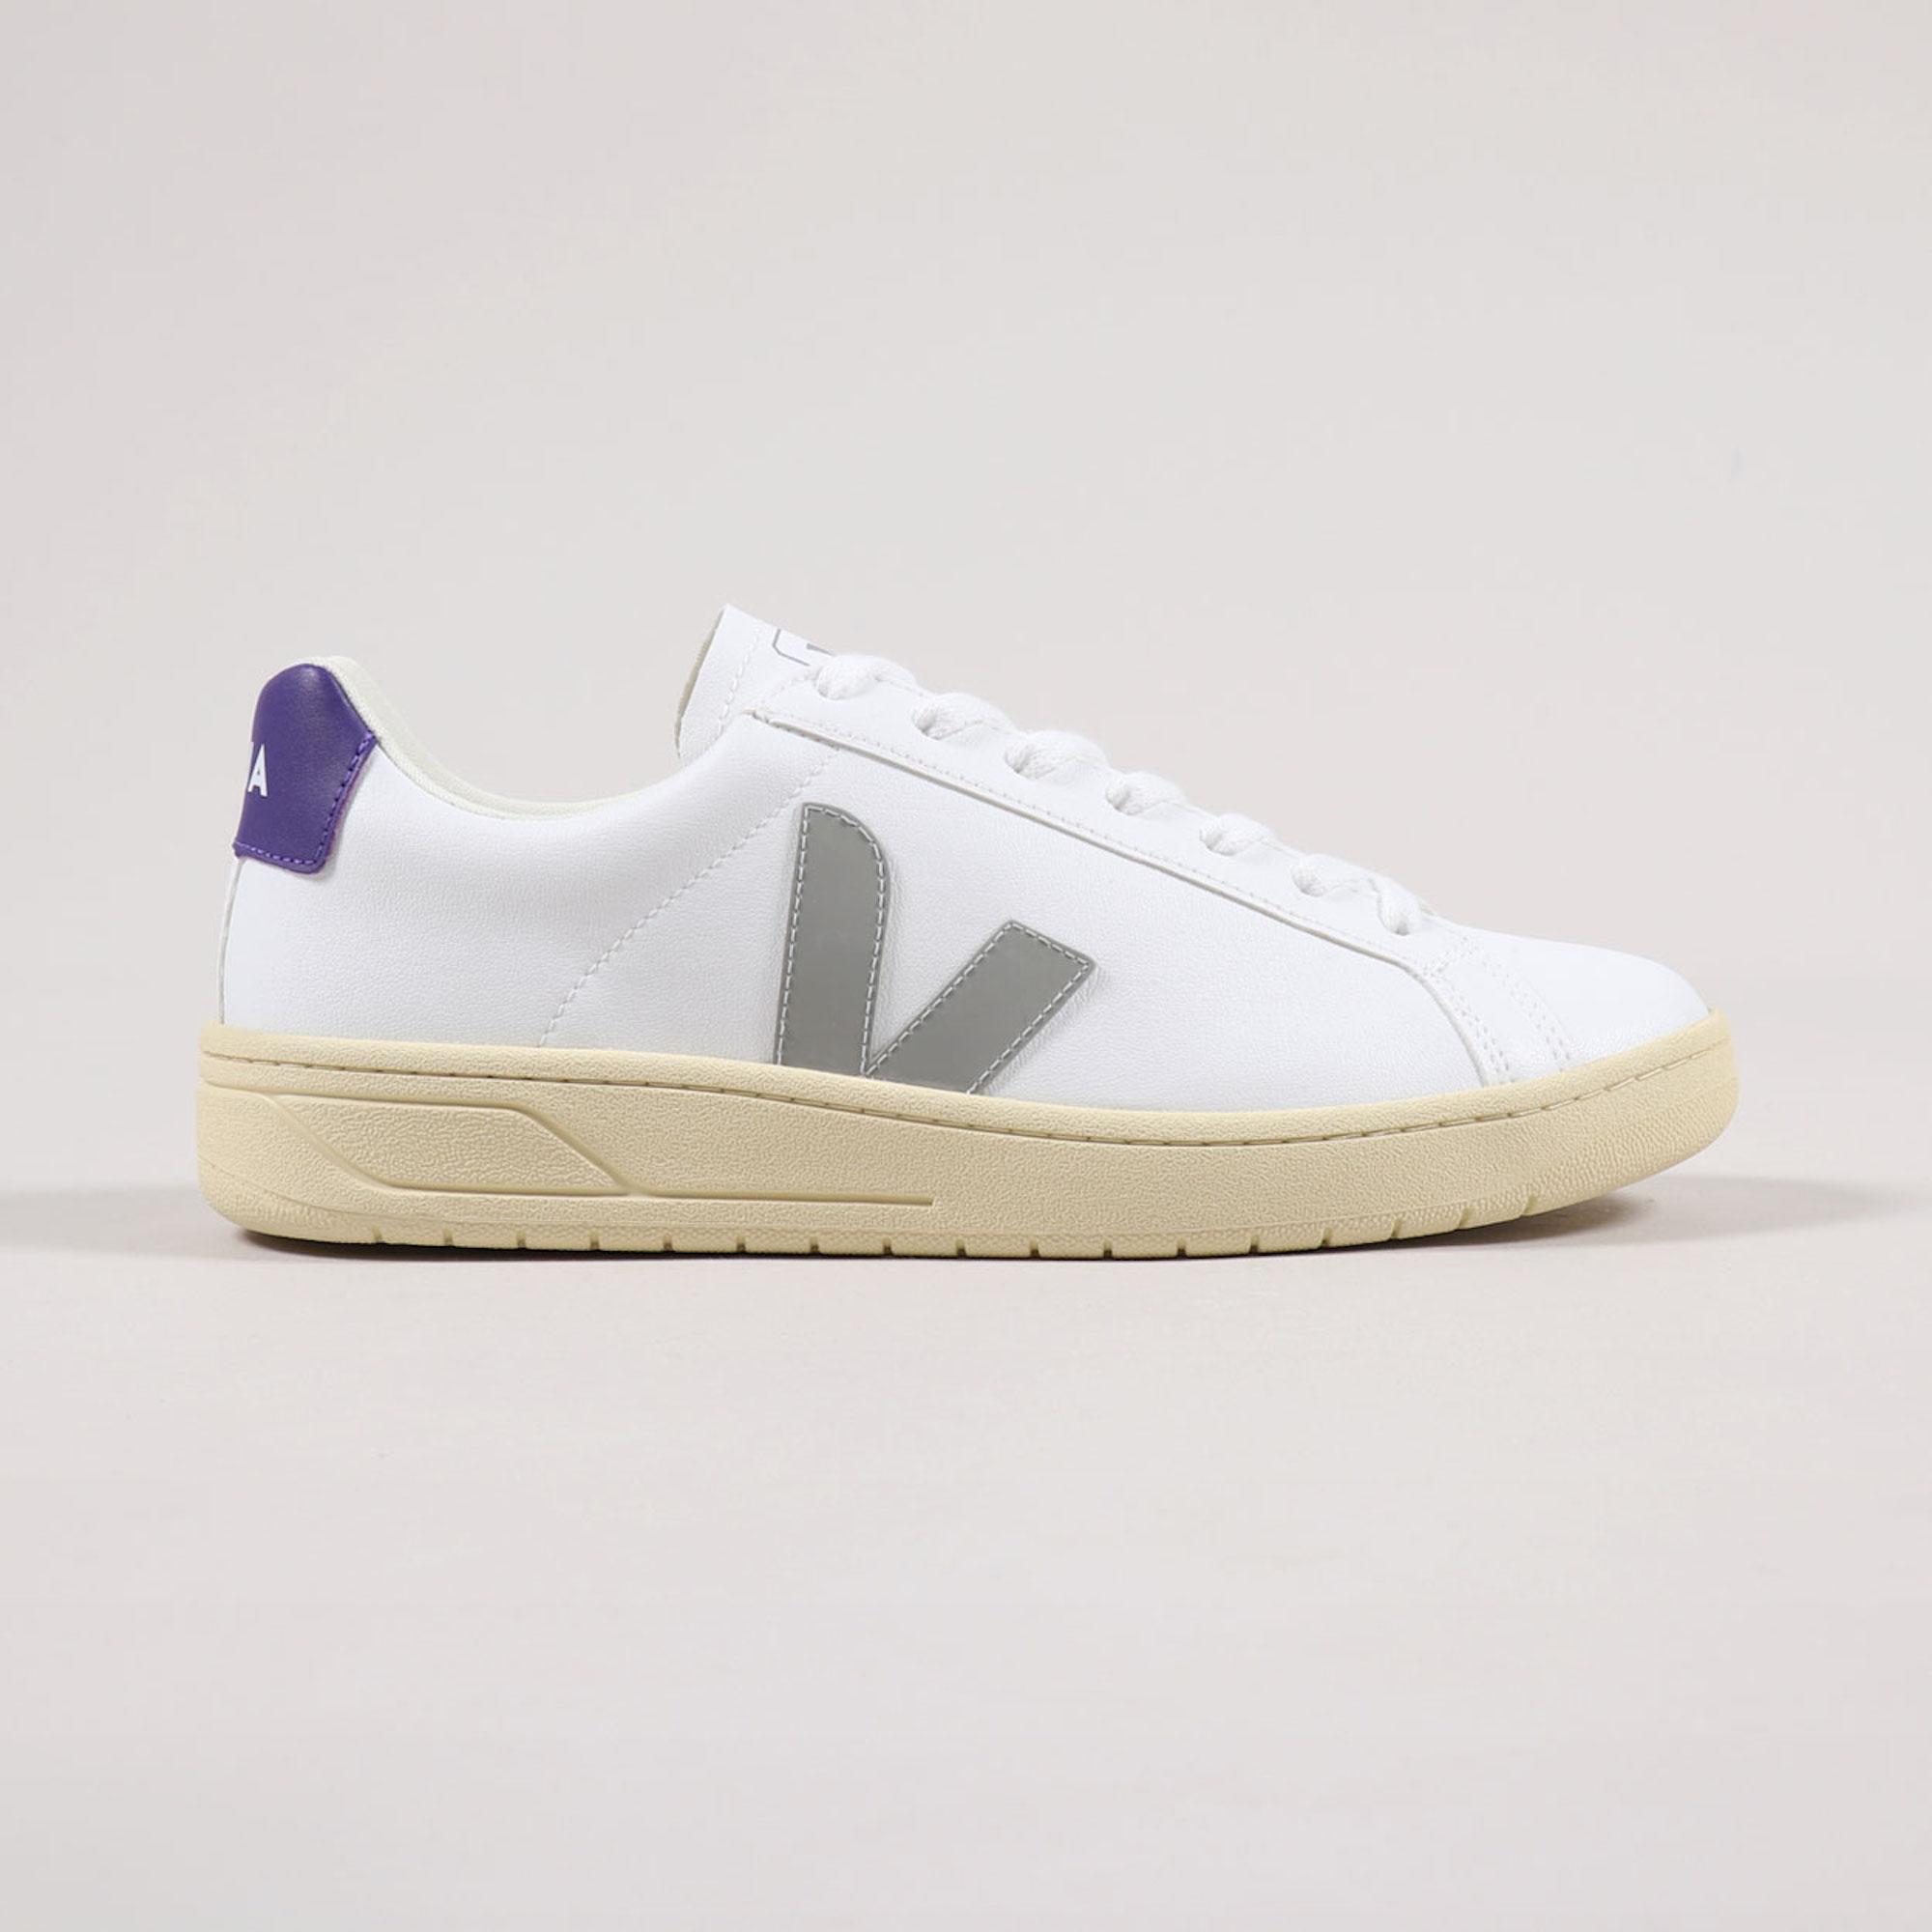 Veja Urca CWL Shoes White Oxford Grey Purple